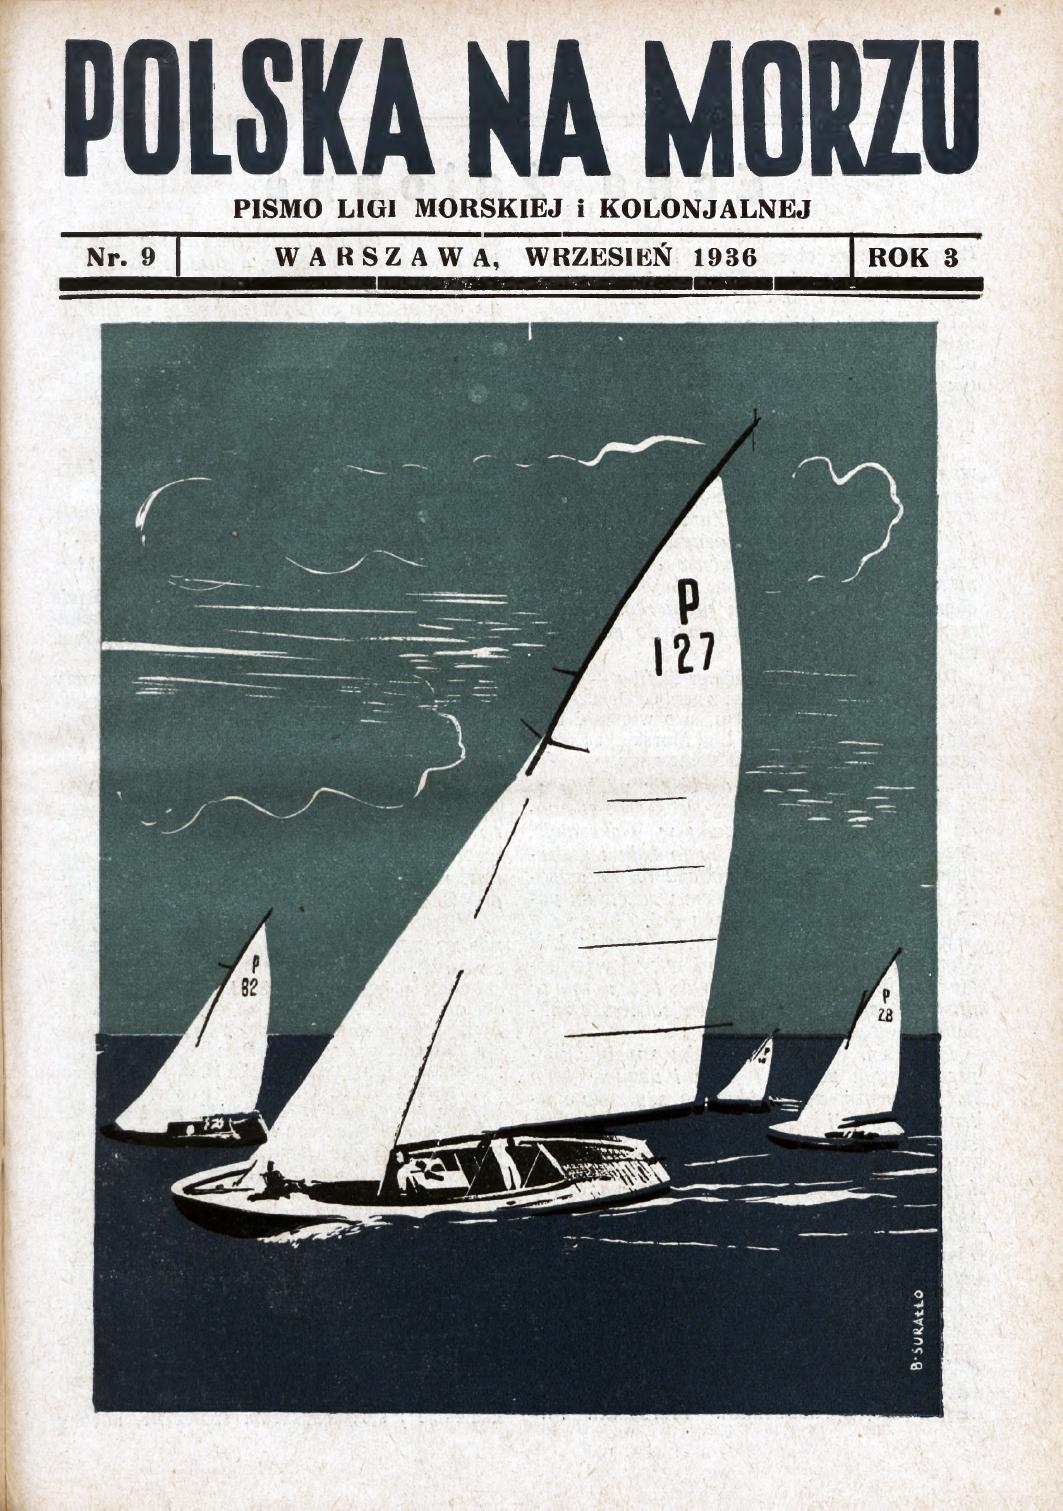 Polska na Morzu : pismo Ligi Morskiej i Kolonjalnej. - Liga Morska i Kolonjalna, 1936, nr 0